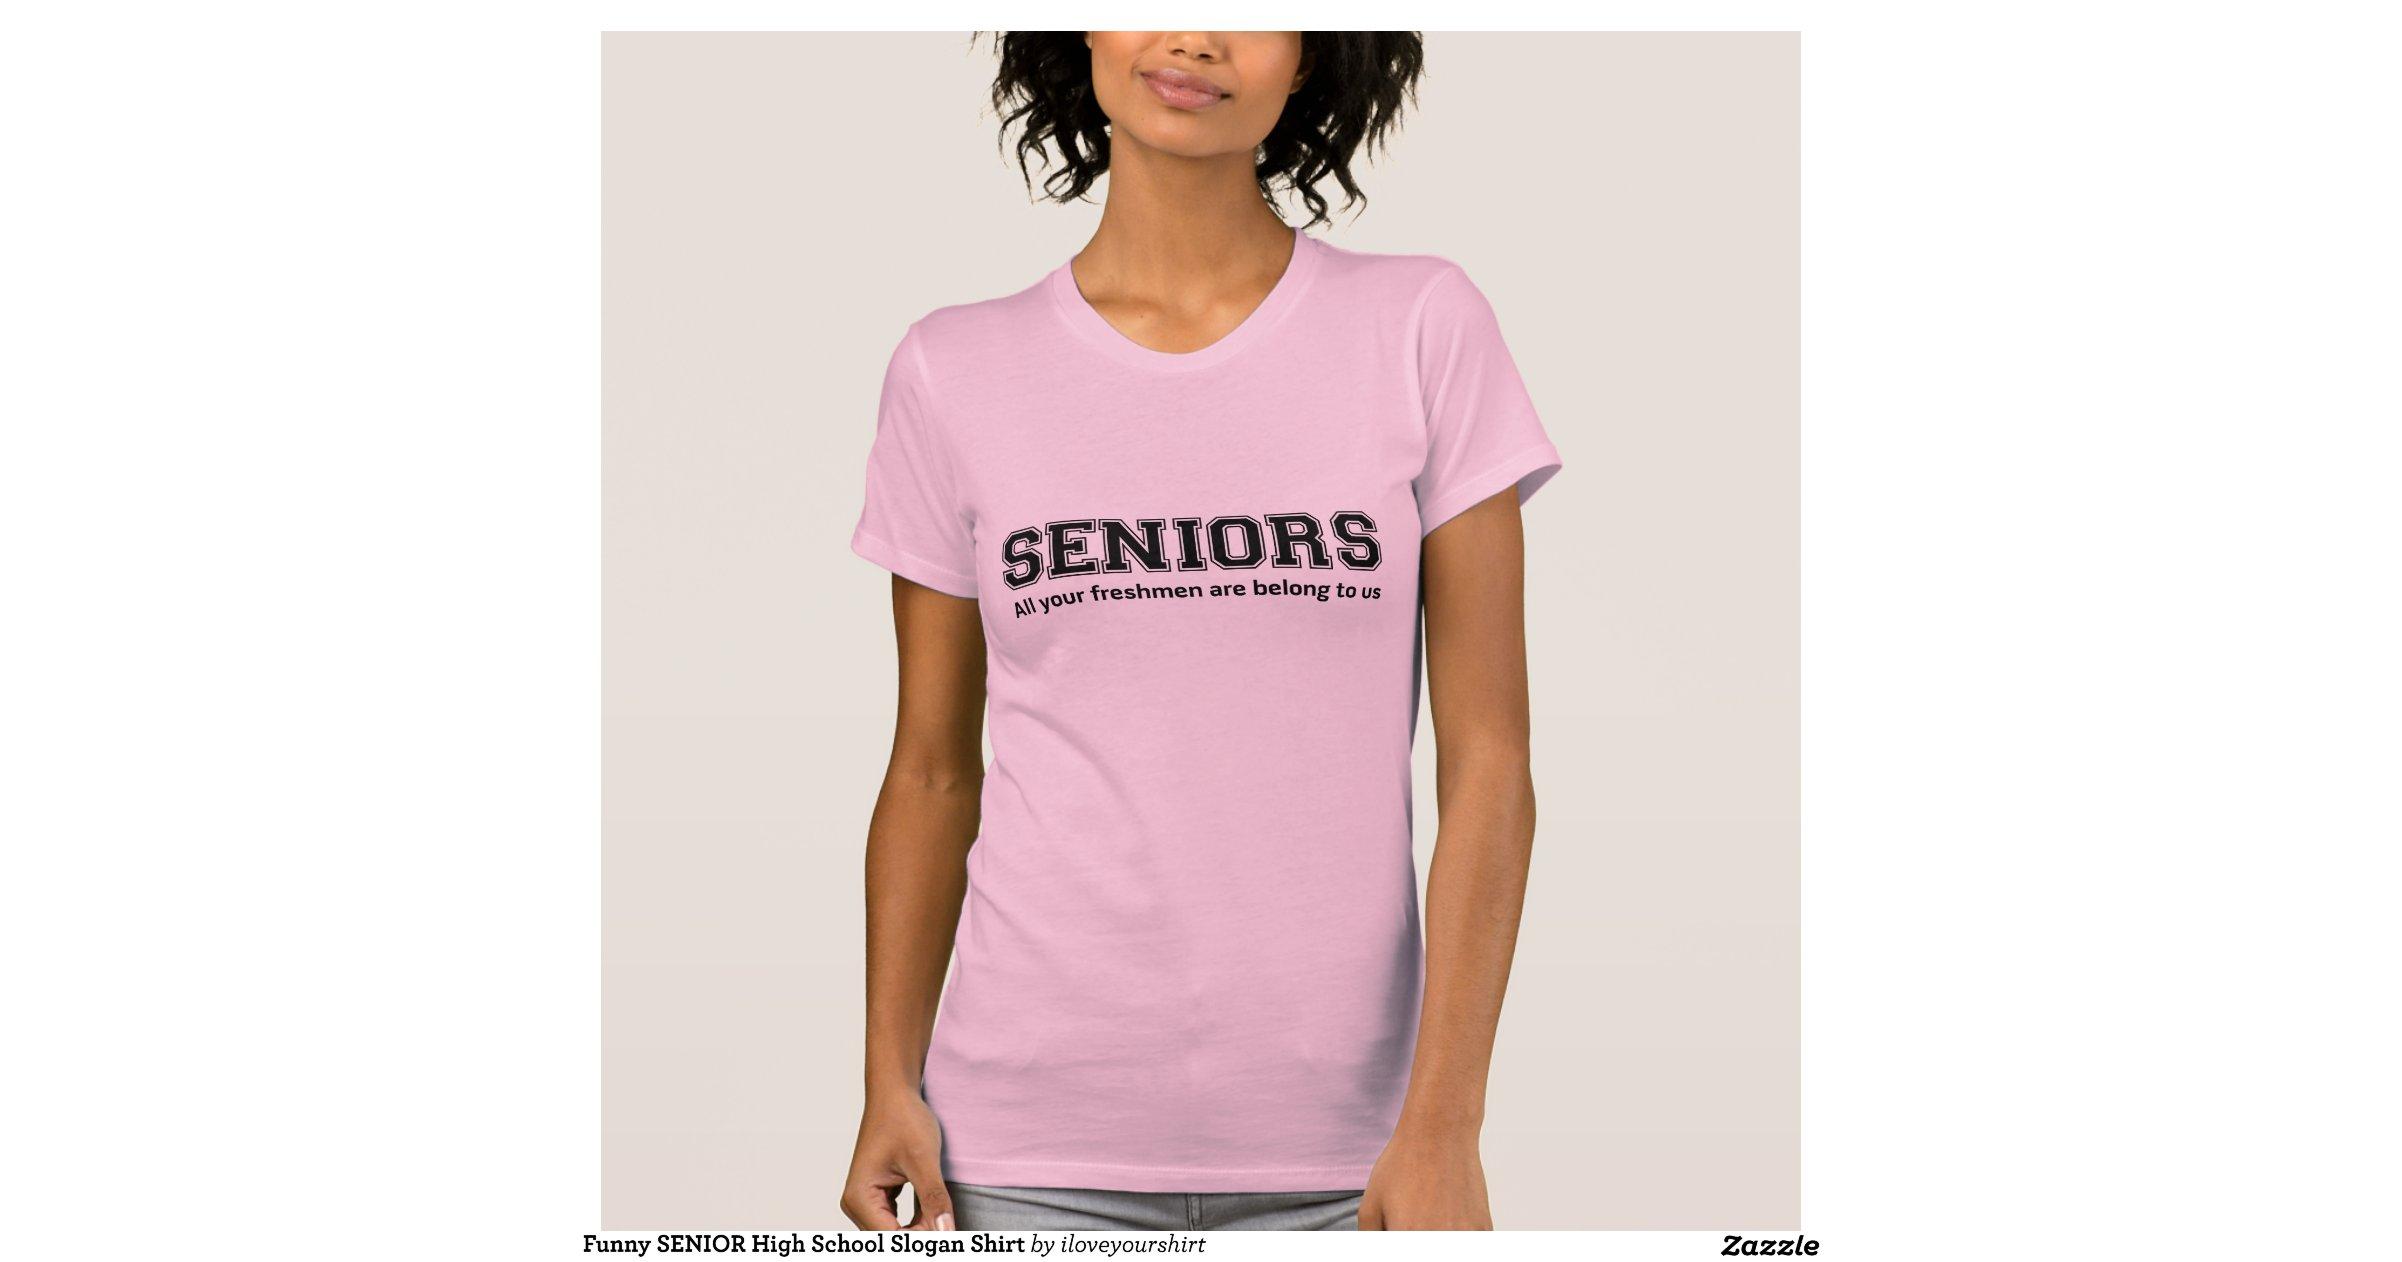 Funny Senior High School Slogan Shirt